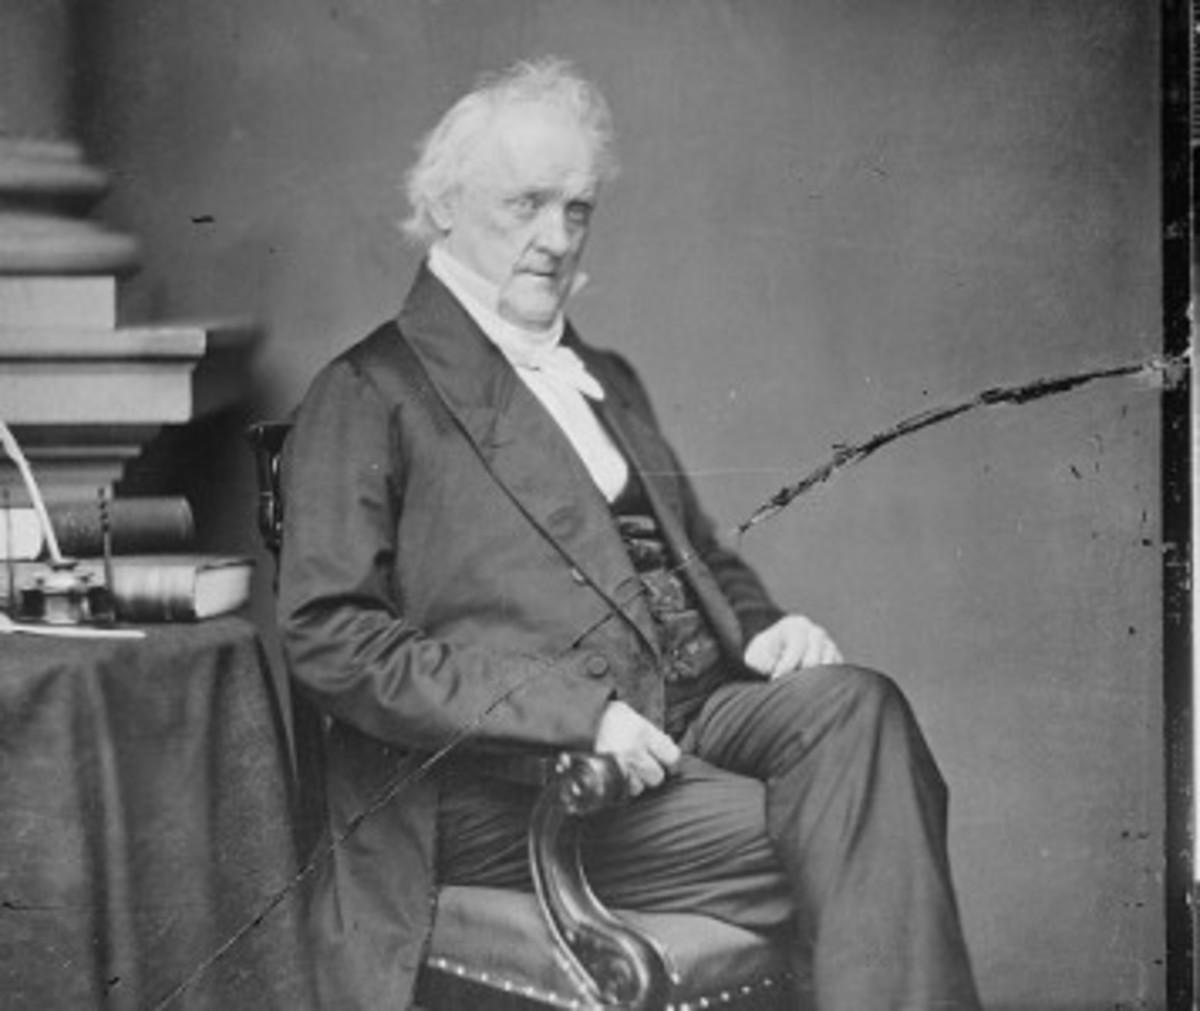 James Buchanan, The Worst President Ever